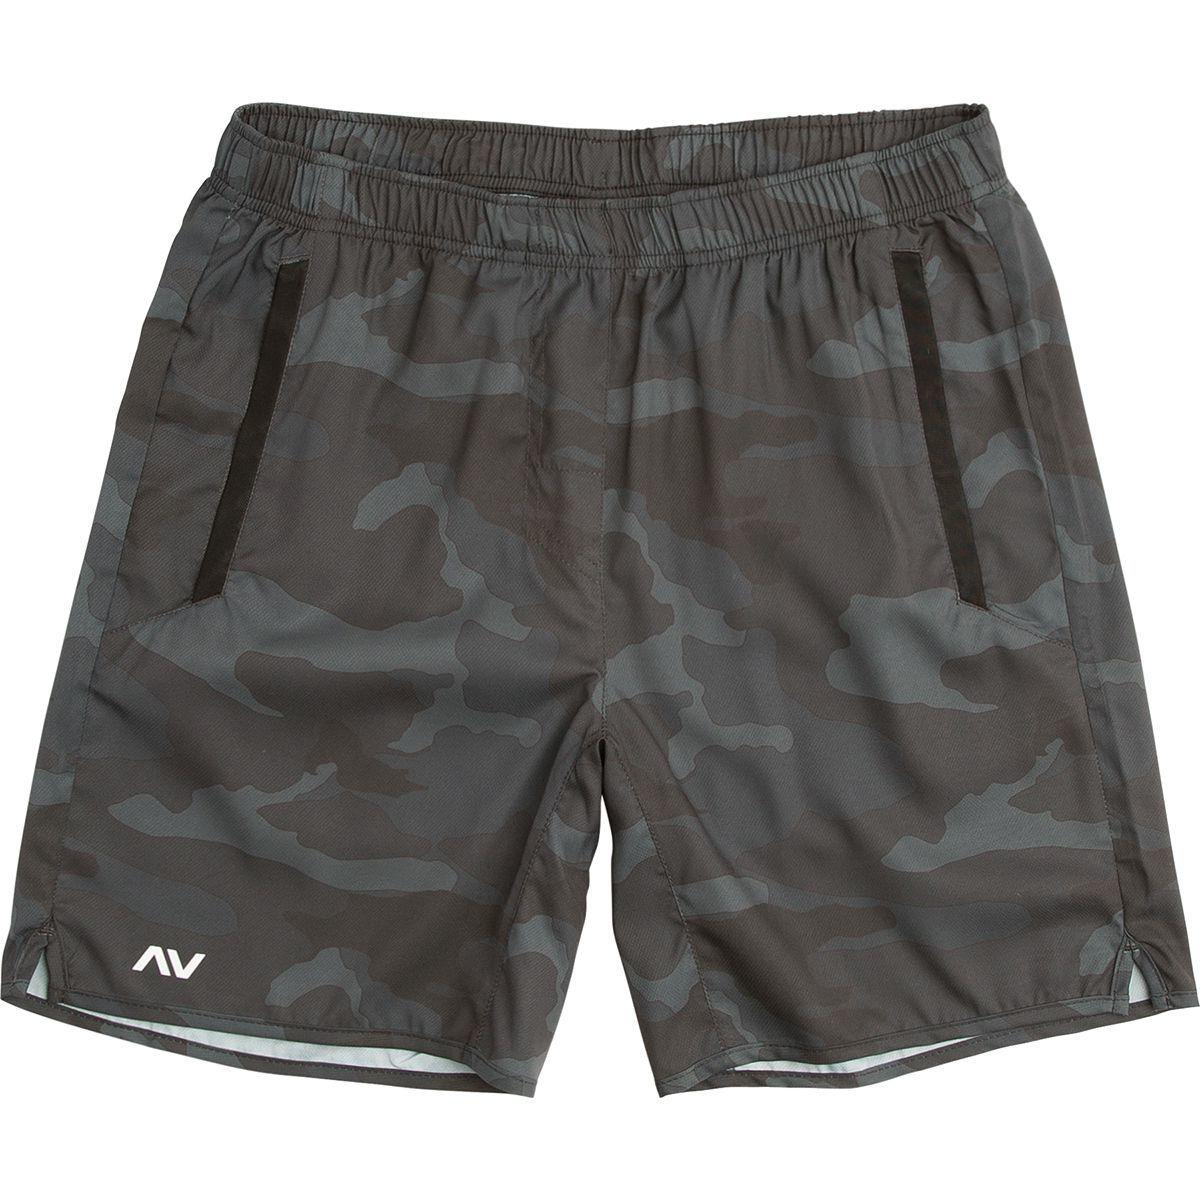 RVCA Yogger III Short - Men's